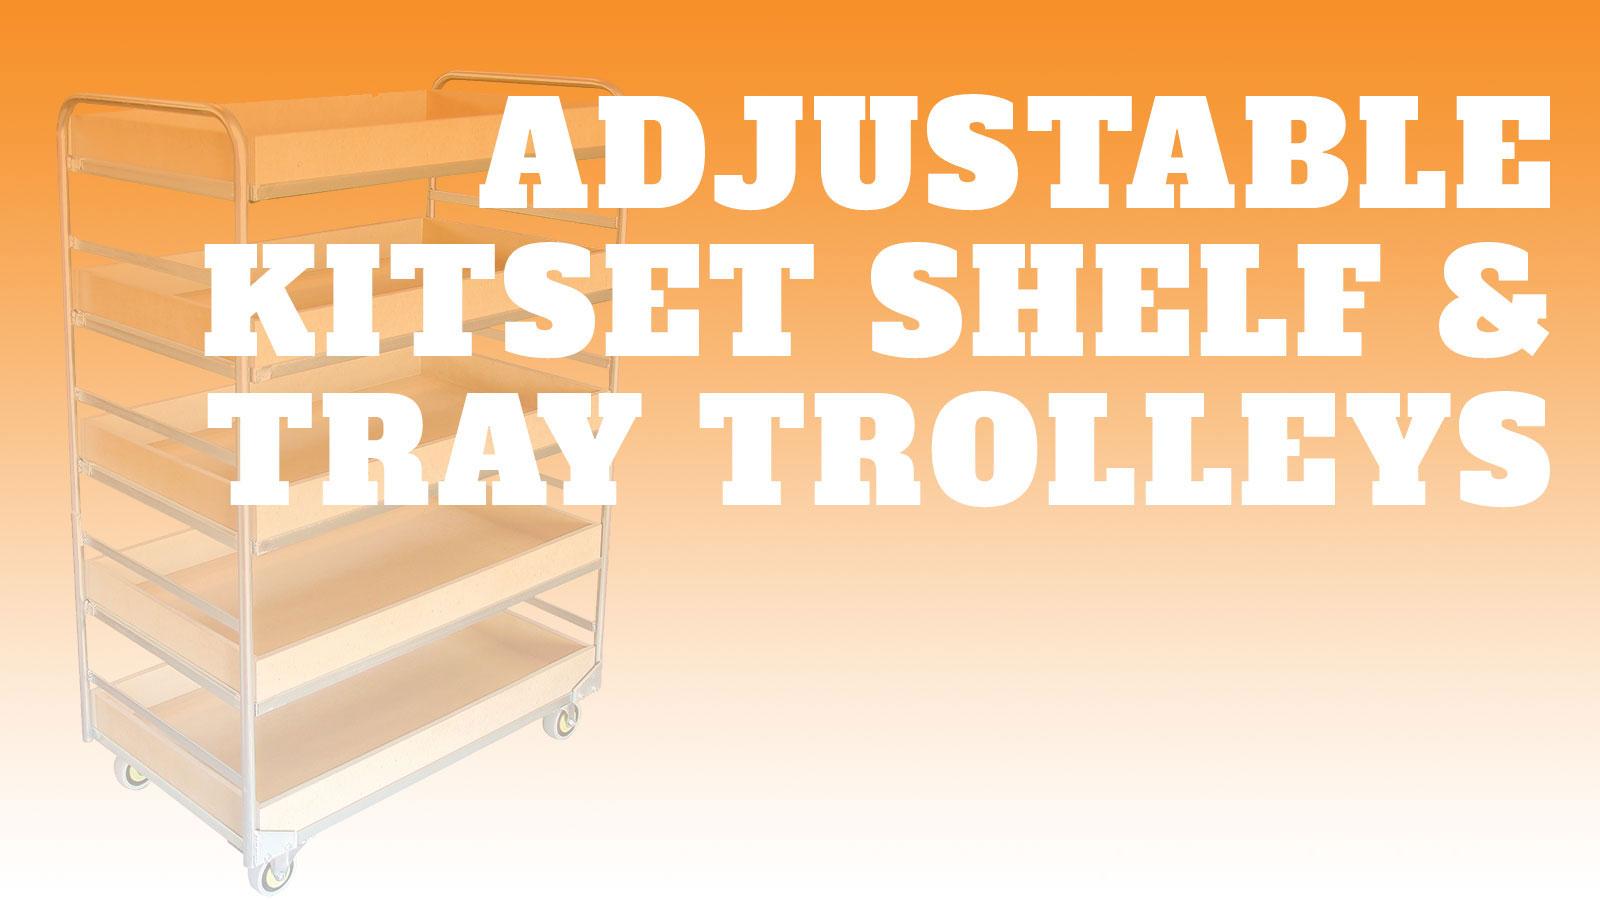 Industrial-Adjustable-Kitset-Shelf-&-Tray